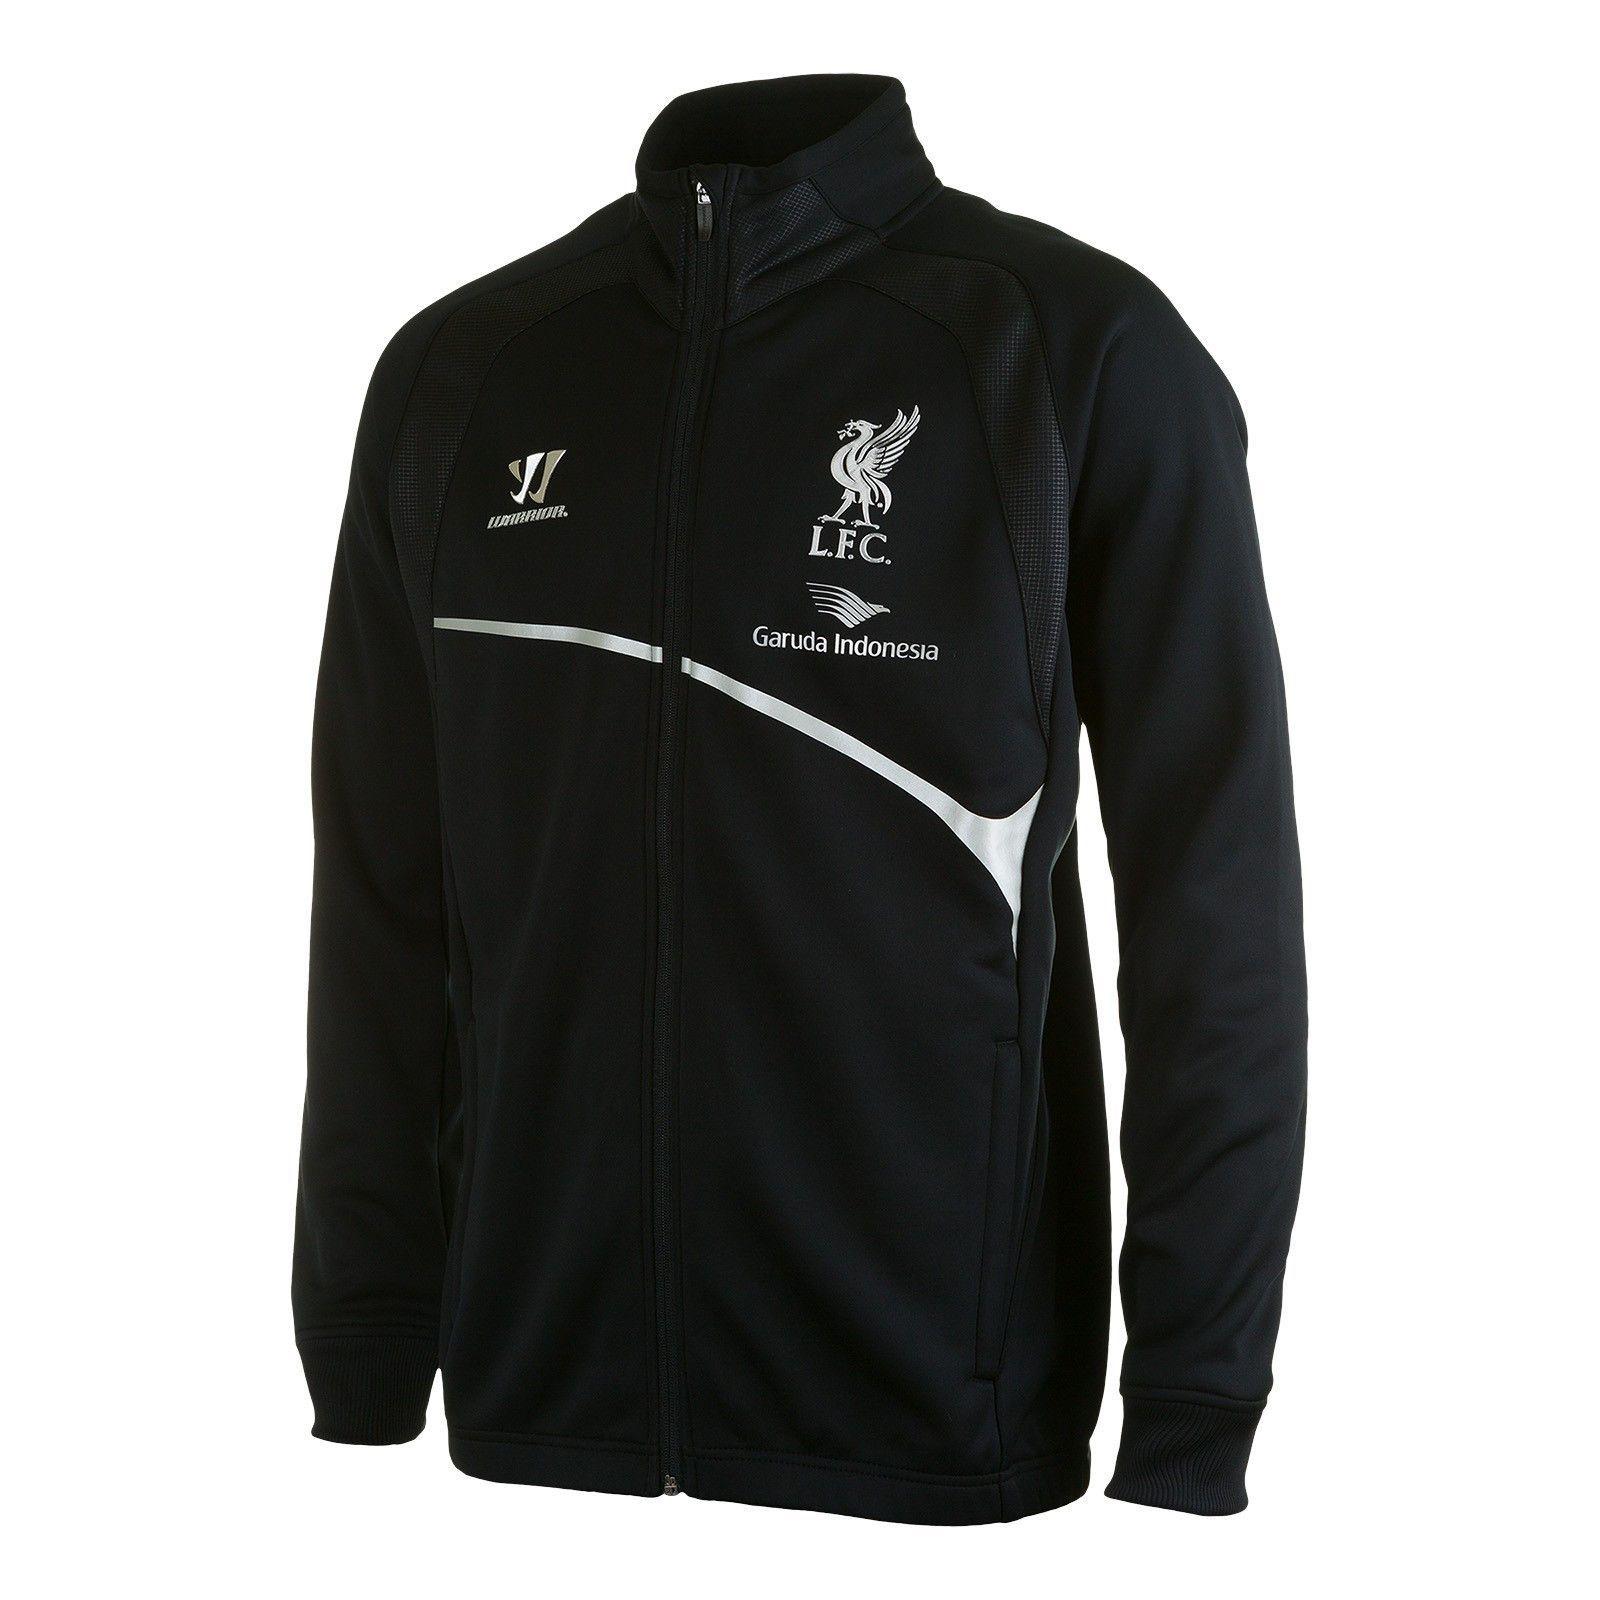 huge selection of 1a63b de2b8 Pin on Liverpool FC